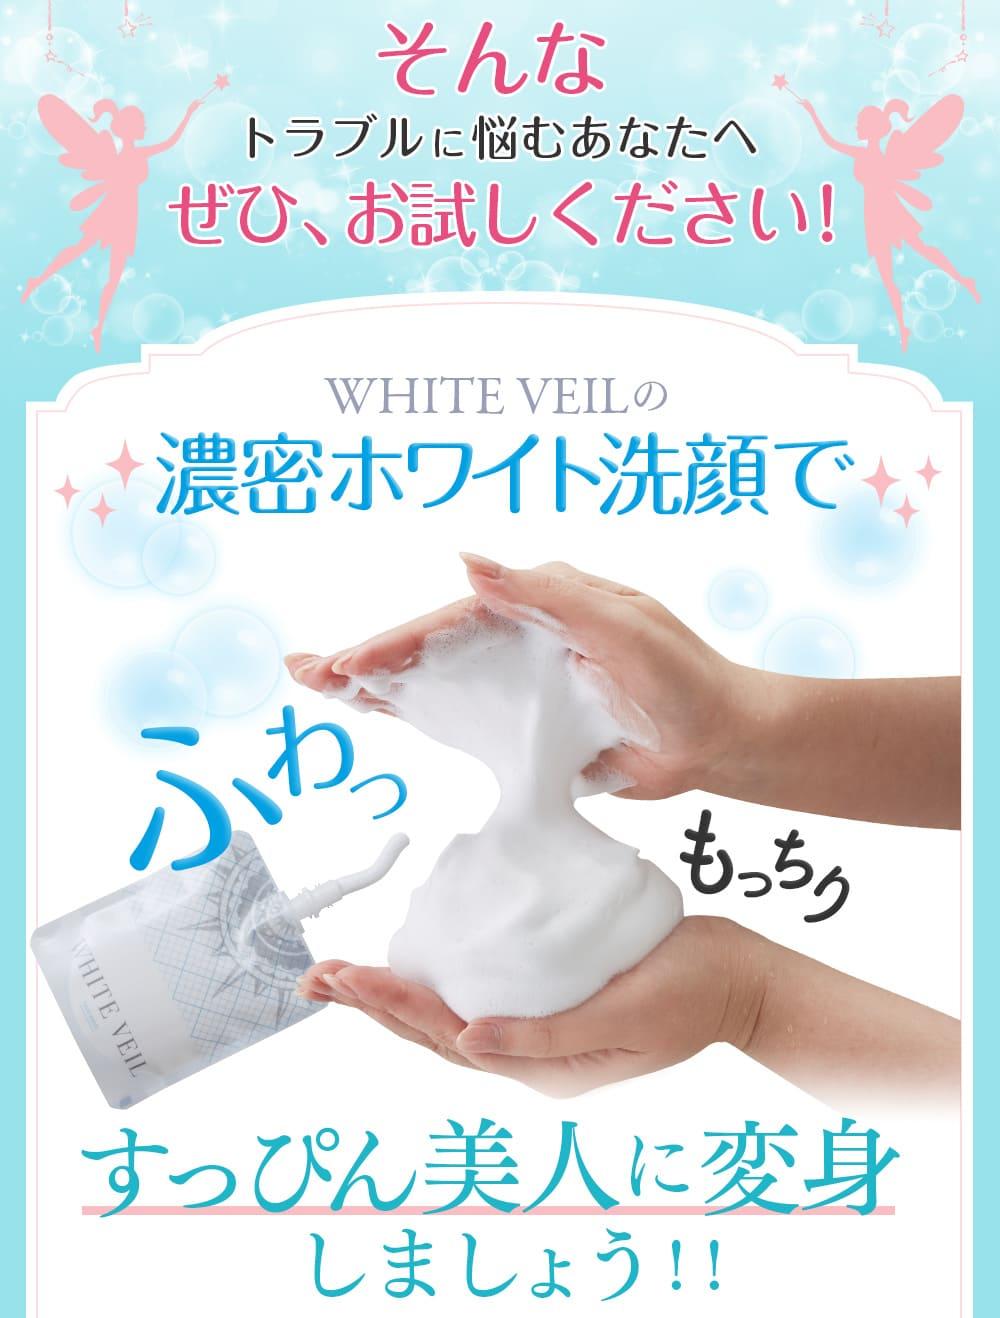 WHITE VEILの濃密白泡洗顔でふわっもっちり すっぴん美人に変身しましょう!!